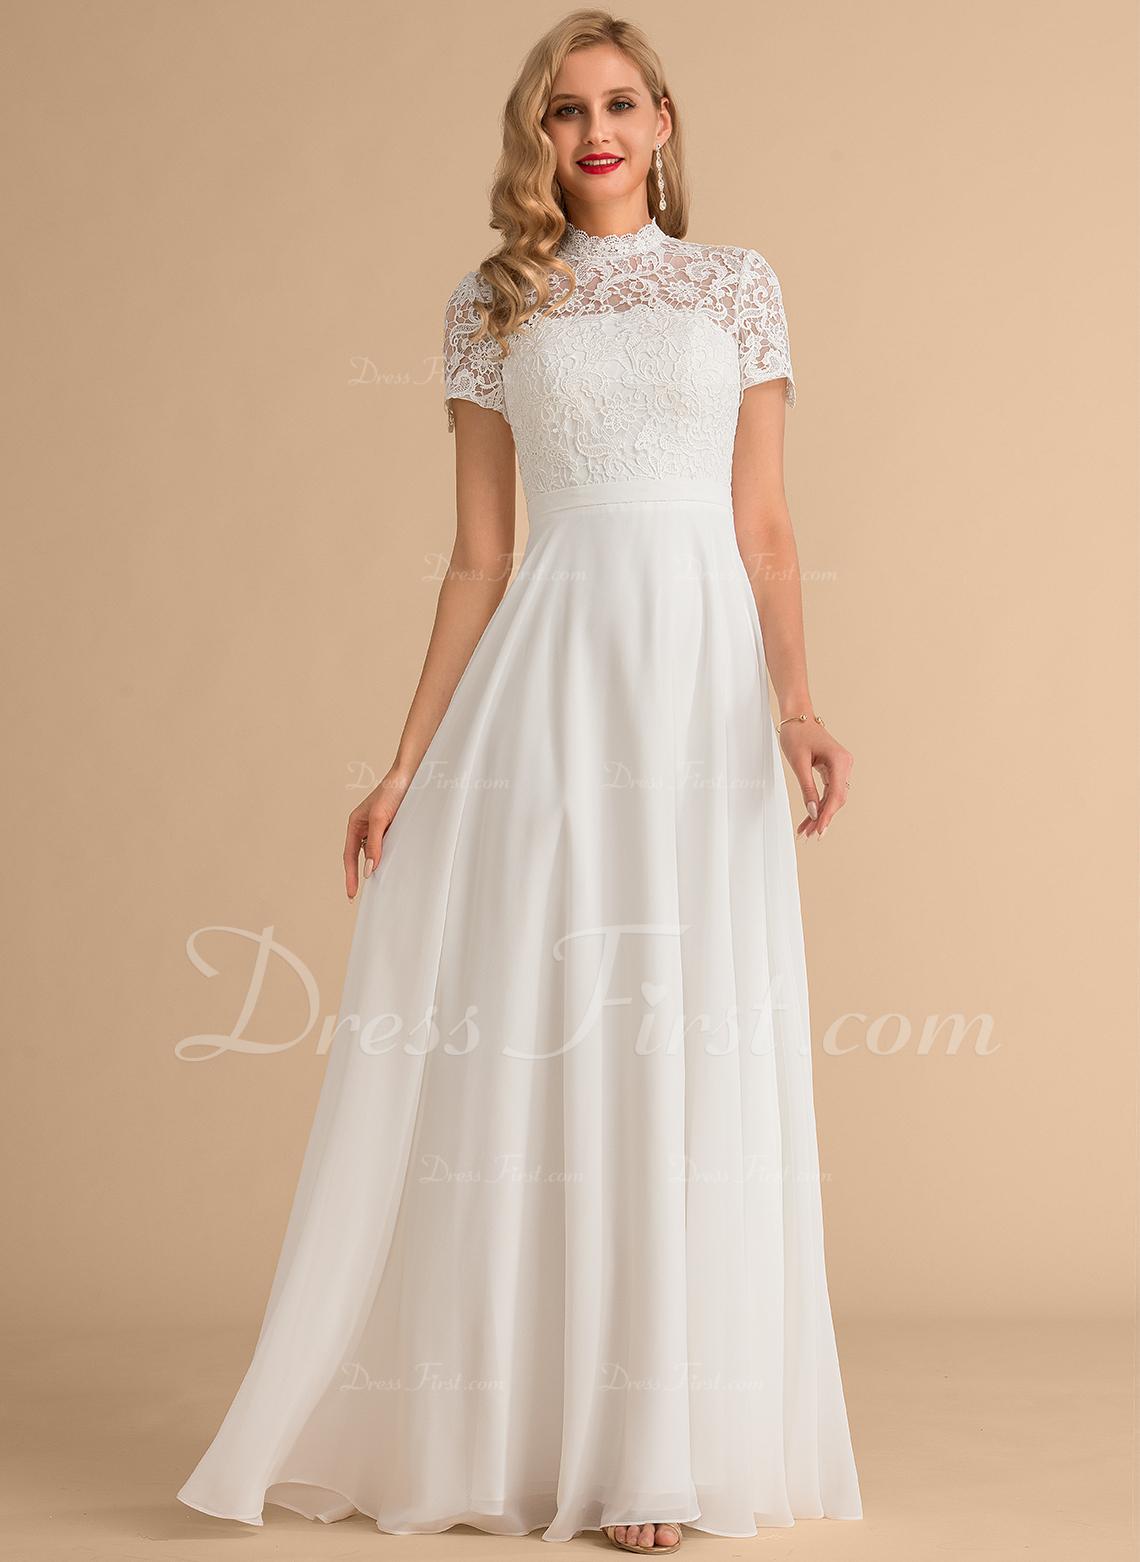 A-Line High Neck Floor-Length Chiffon Lace Wedding Dress